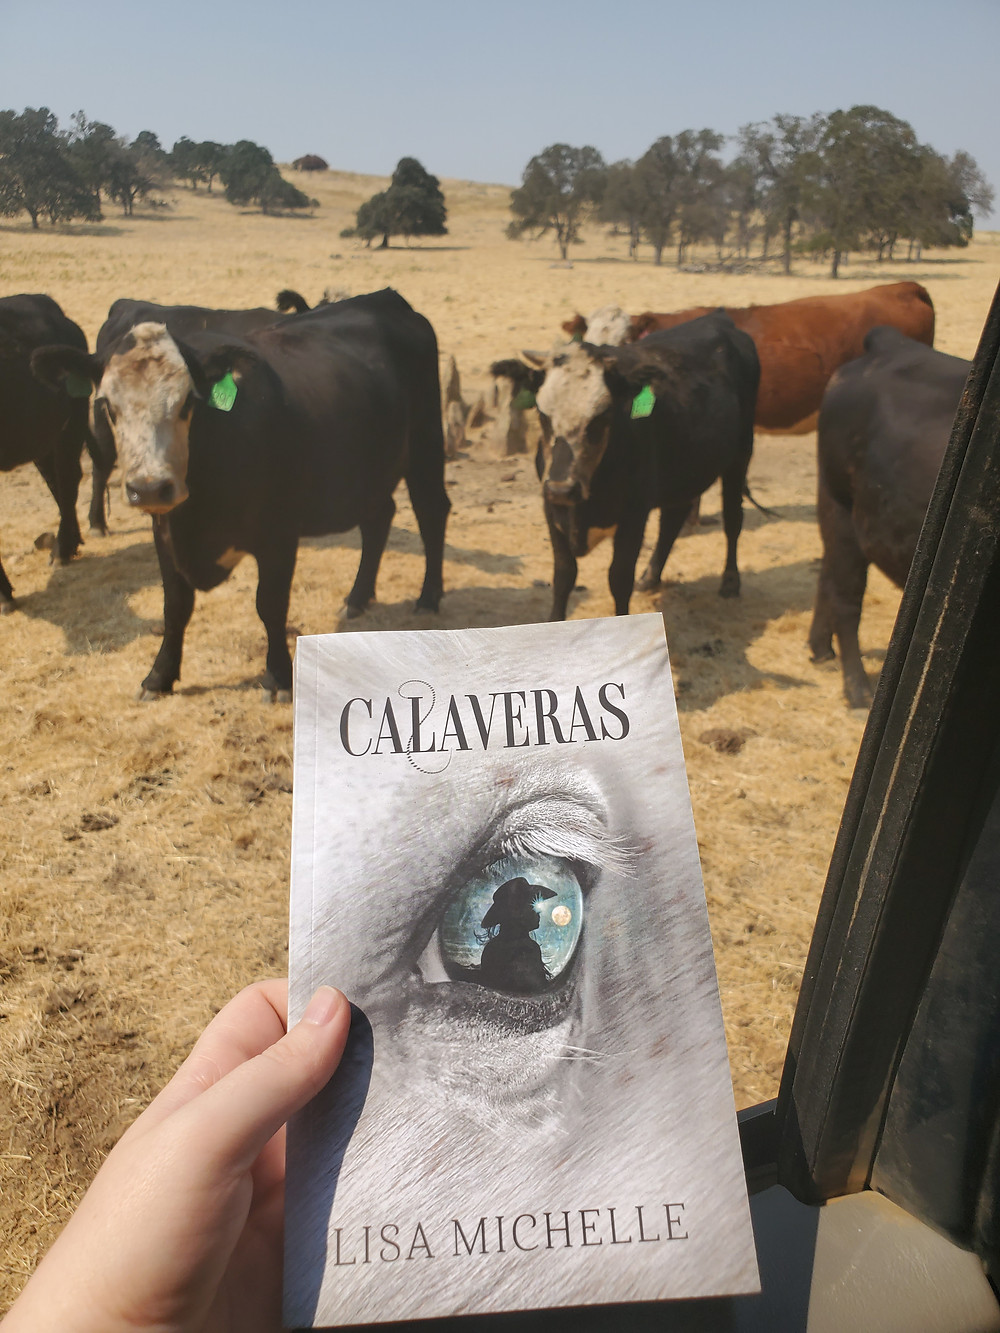 Cattle gather around new novel Calaveras by author Lisa Michelle